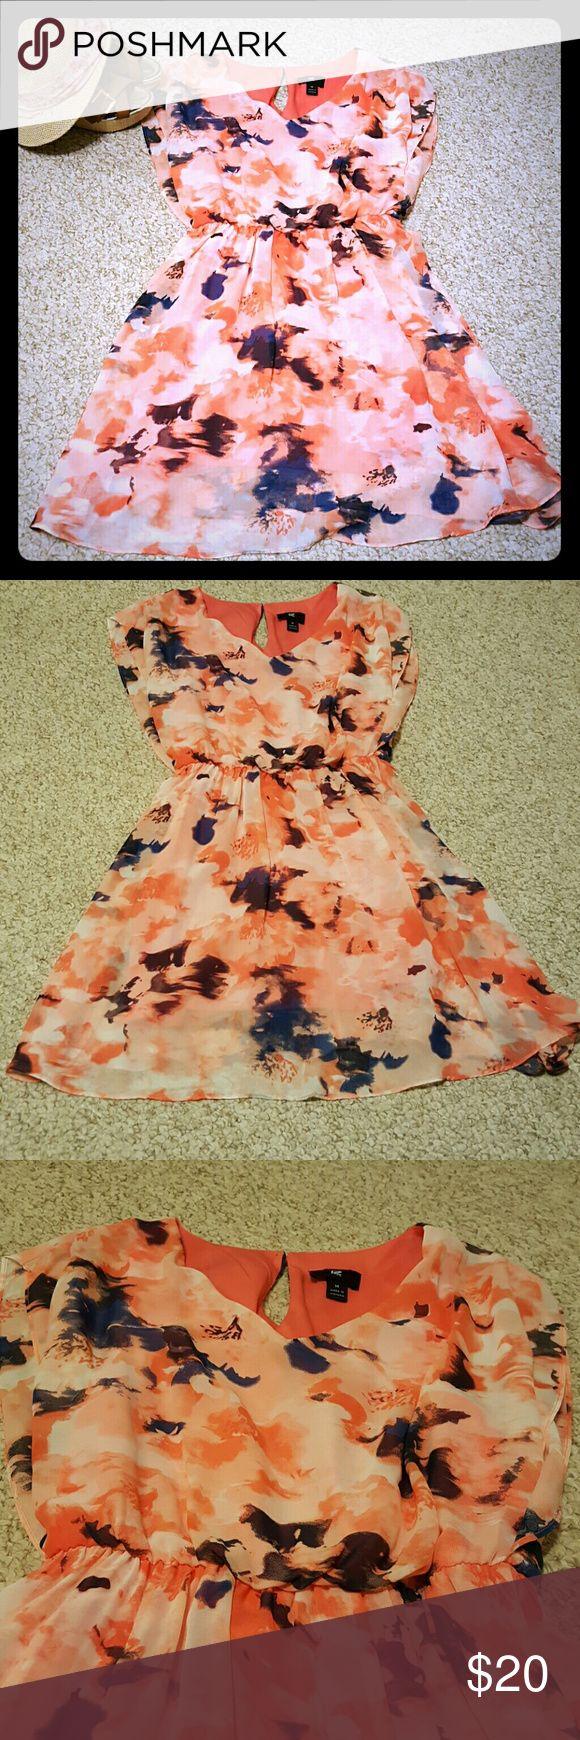 🎆SALE🎆Beautiful flowy summer dress🎆 Beautiful summer dress. Flowy, butterfly sleeves. Iz Byer Dresses Mini